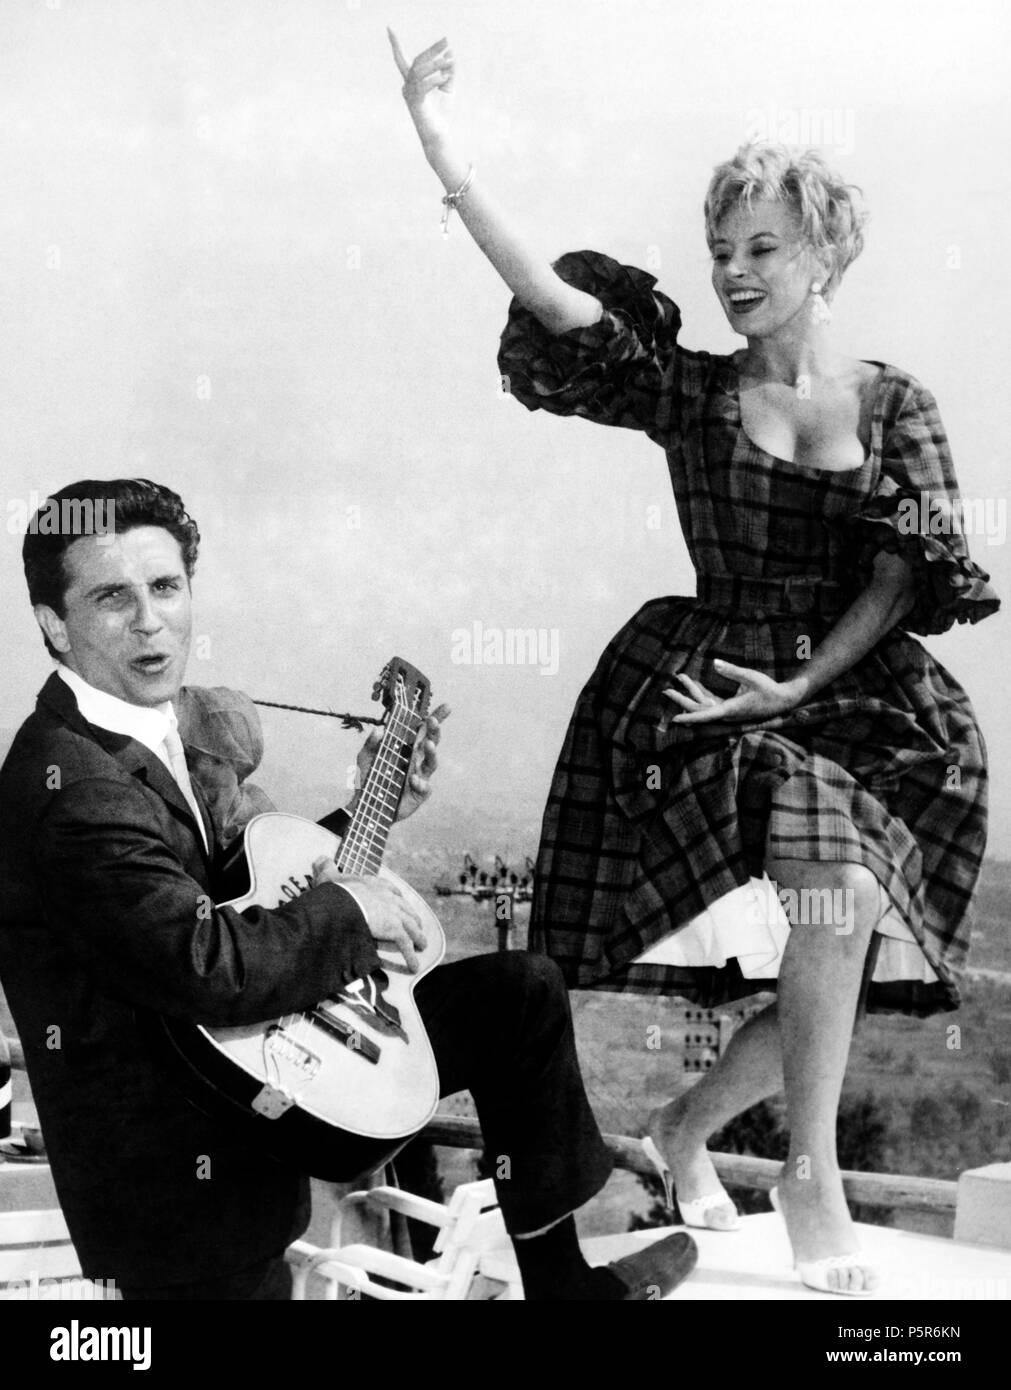 Gilbert Bécaud, Magali noel, 1960 Photo Stock